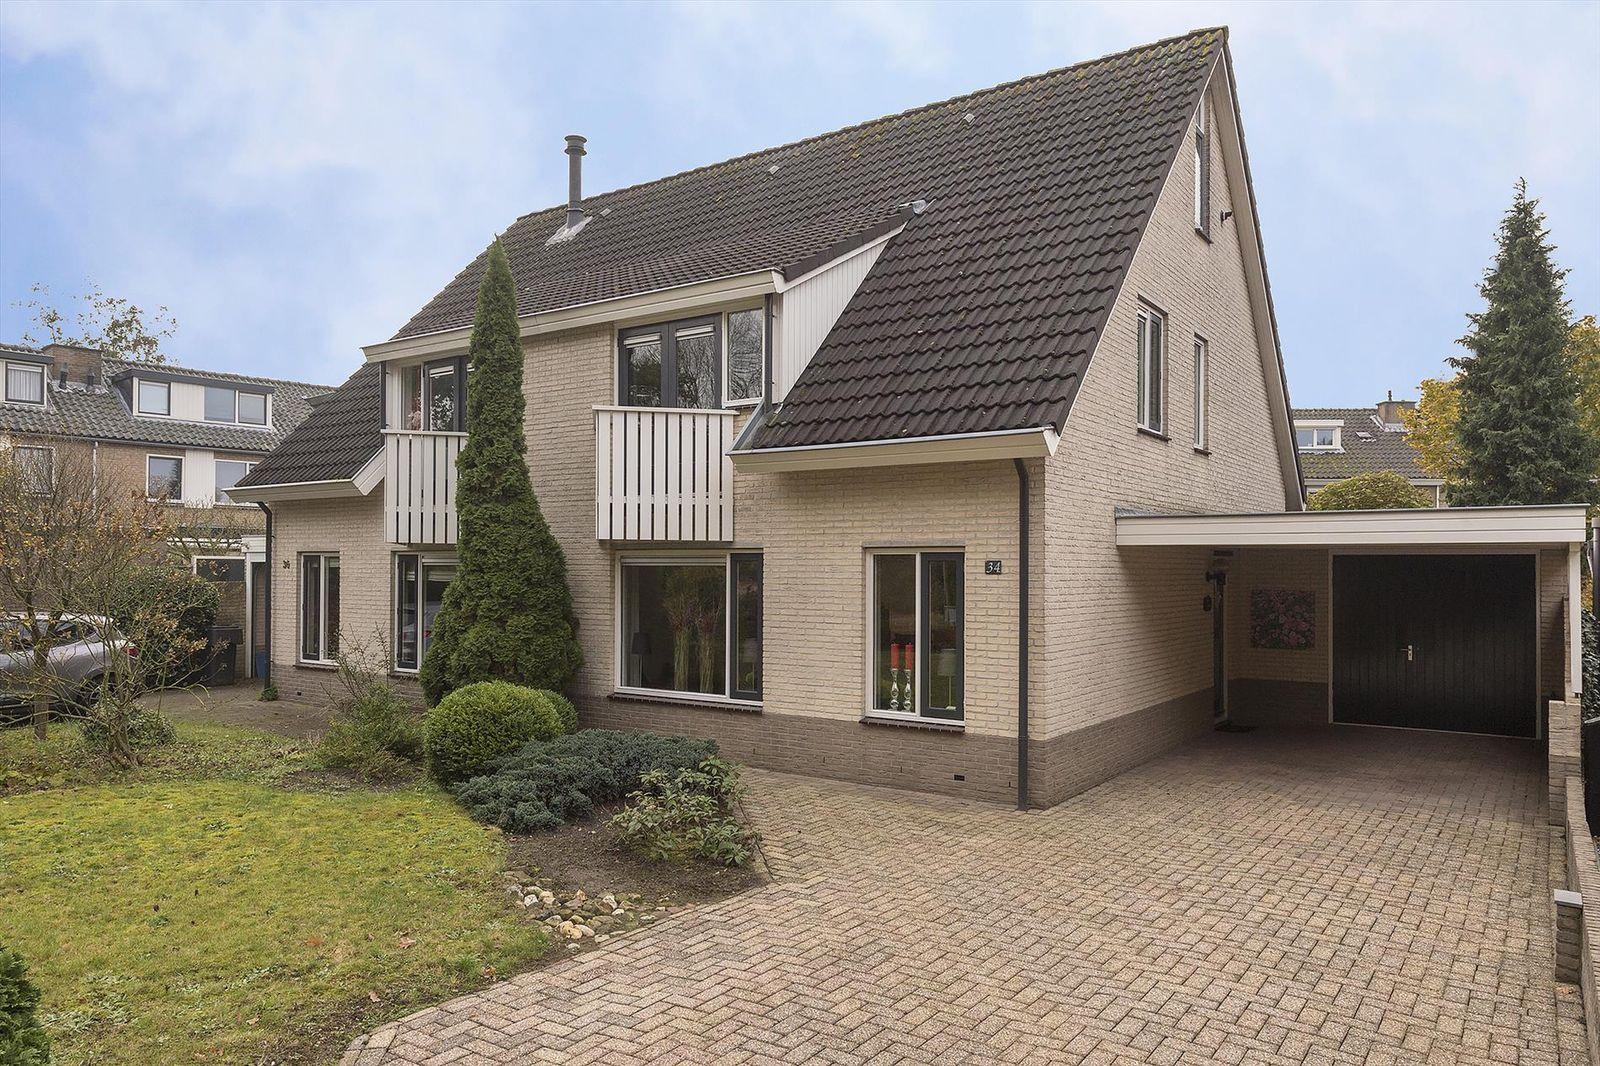 J.P. Heyelaan 34, Harderwijk